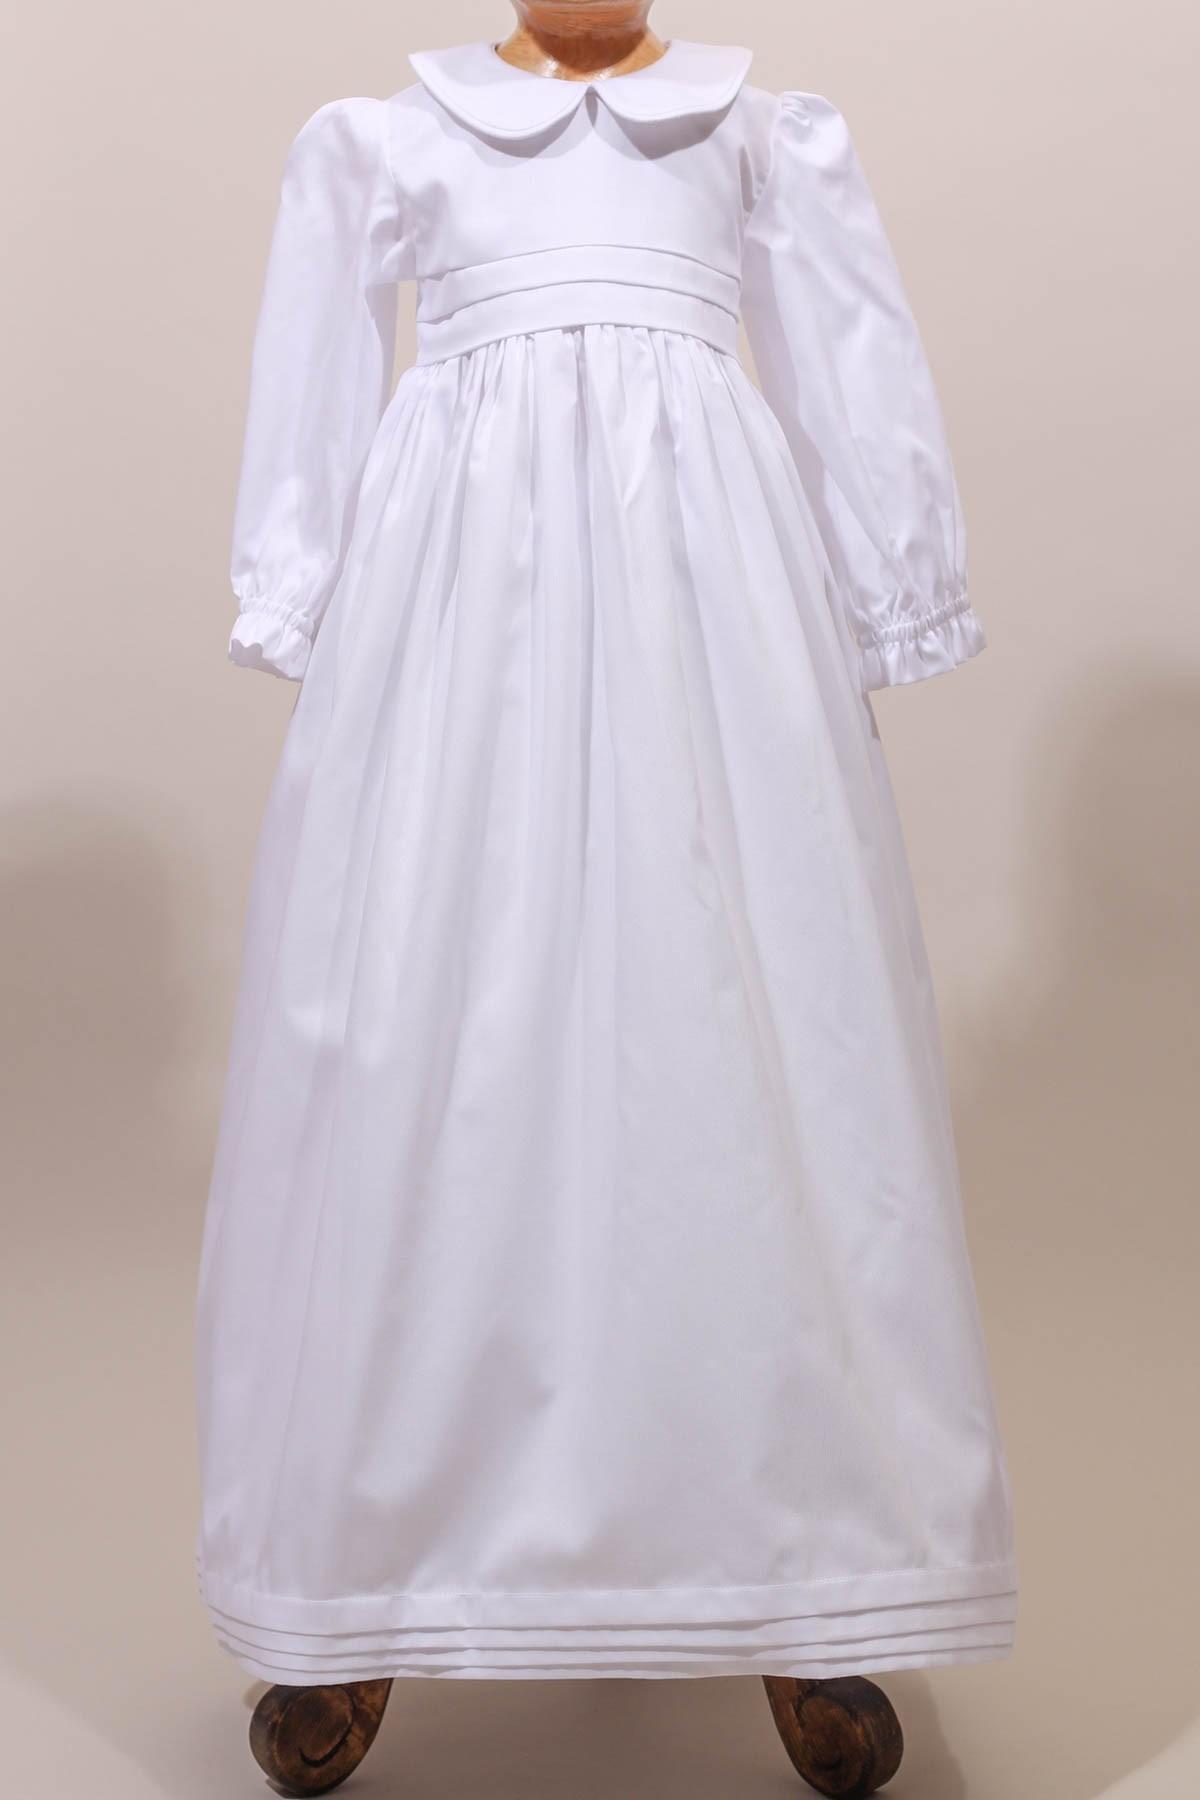 Robe Longue De Bapteme Fabriquee En France